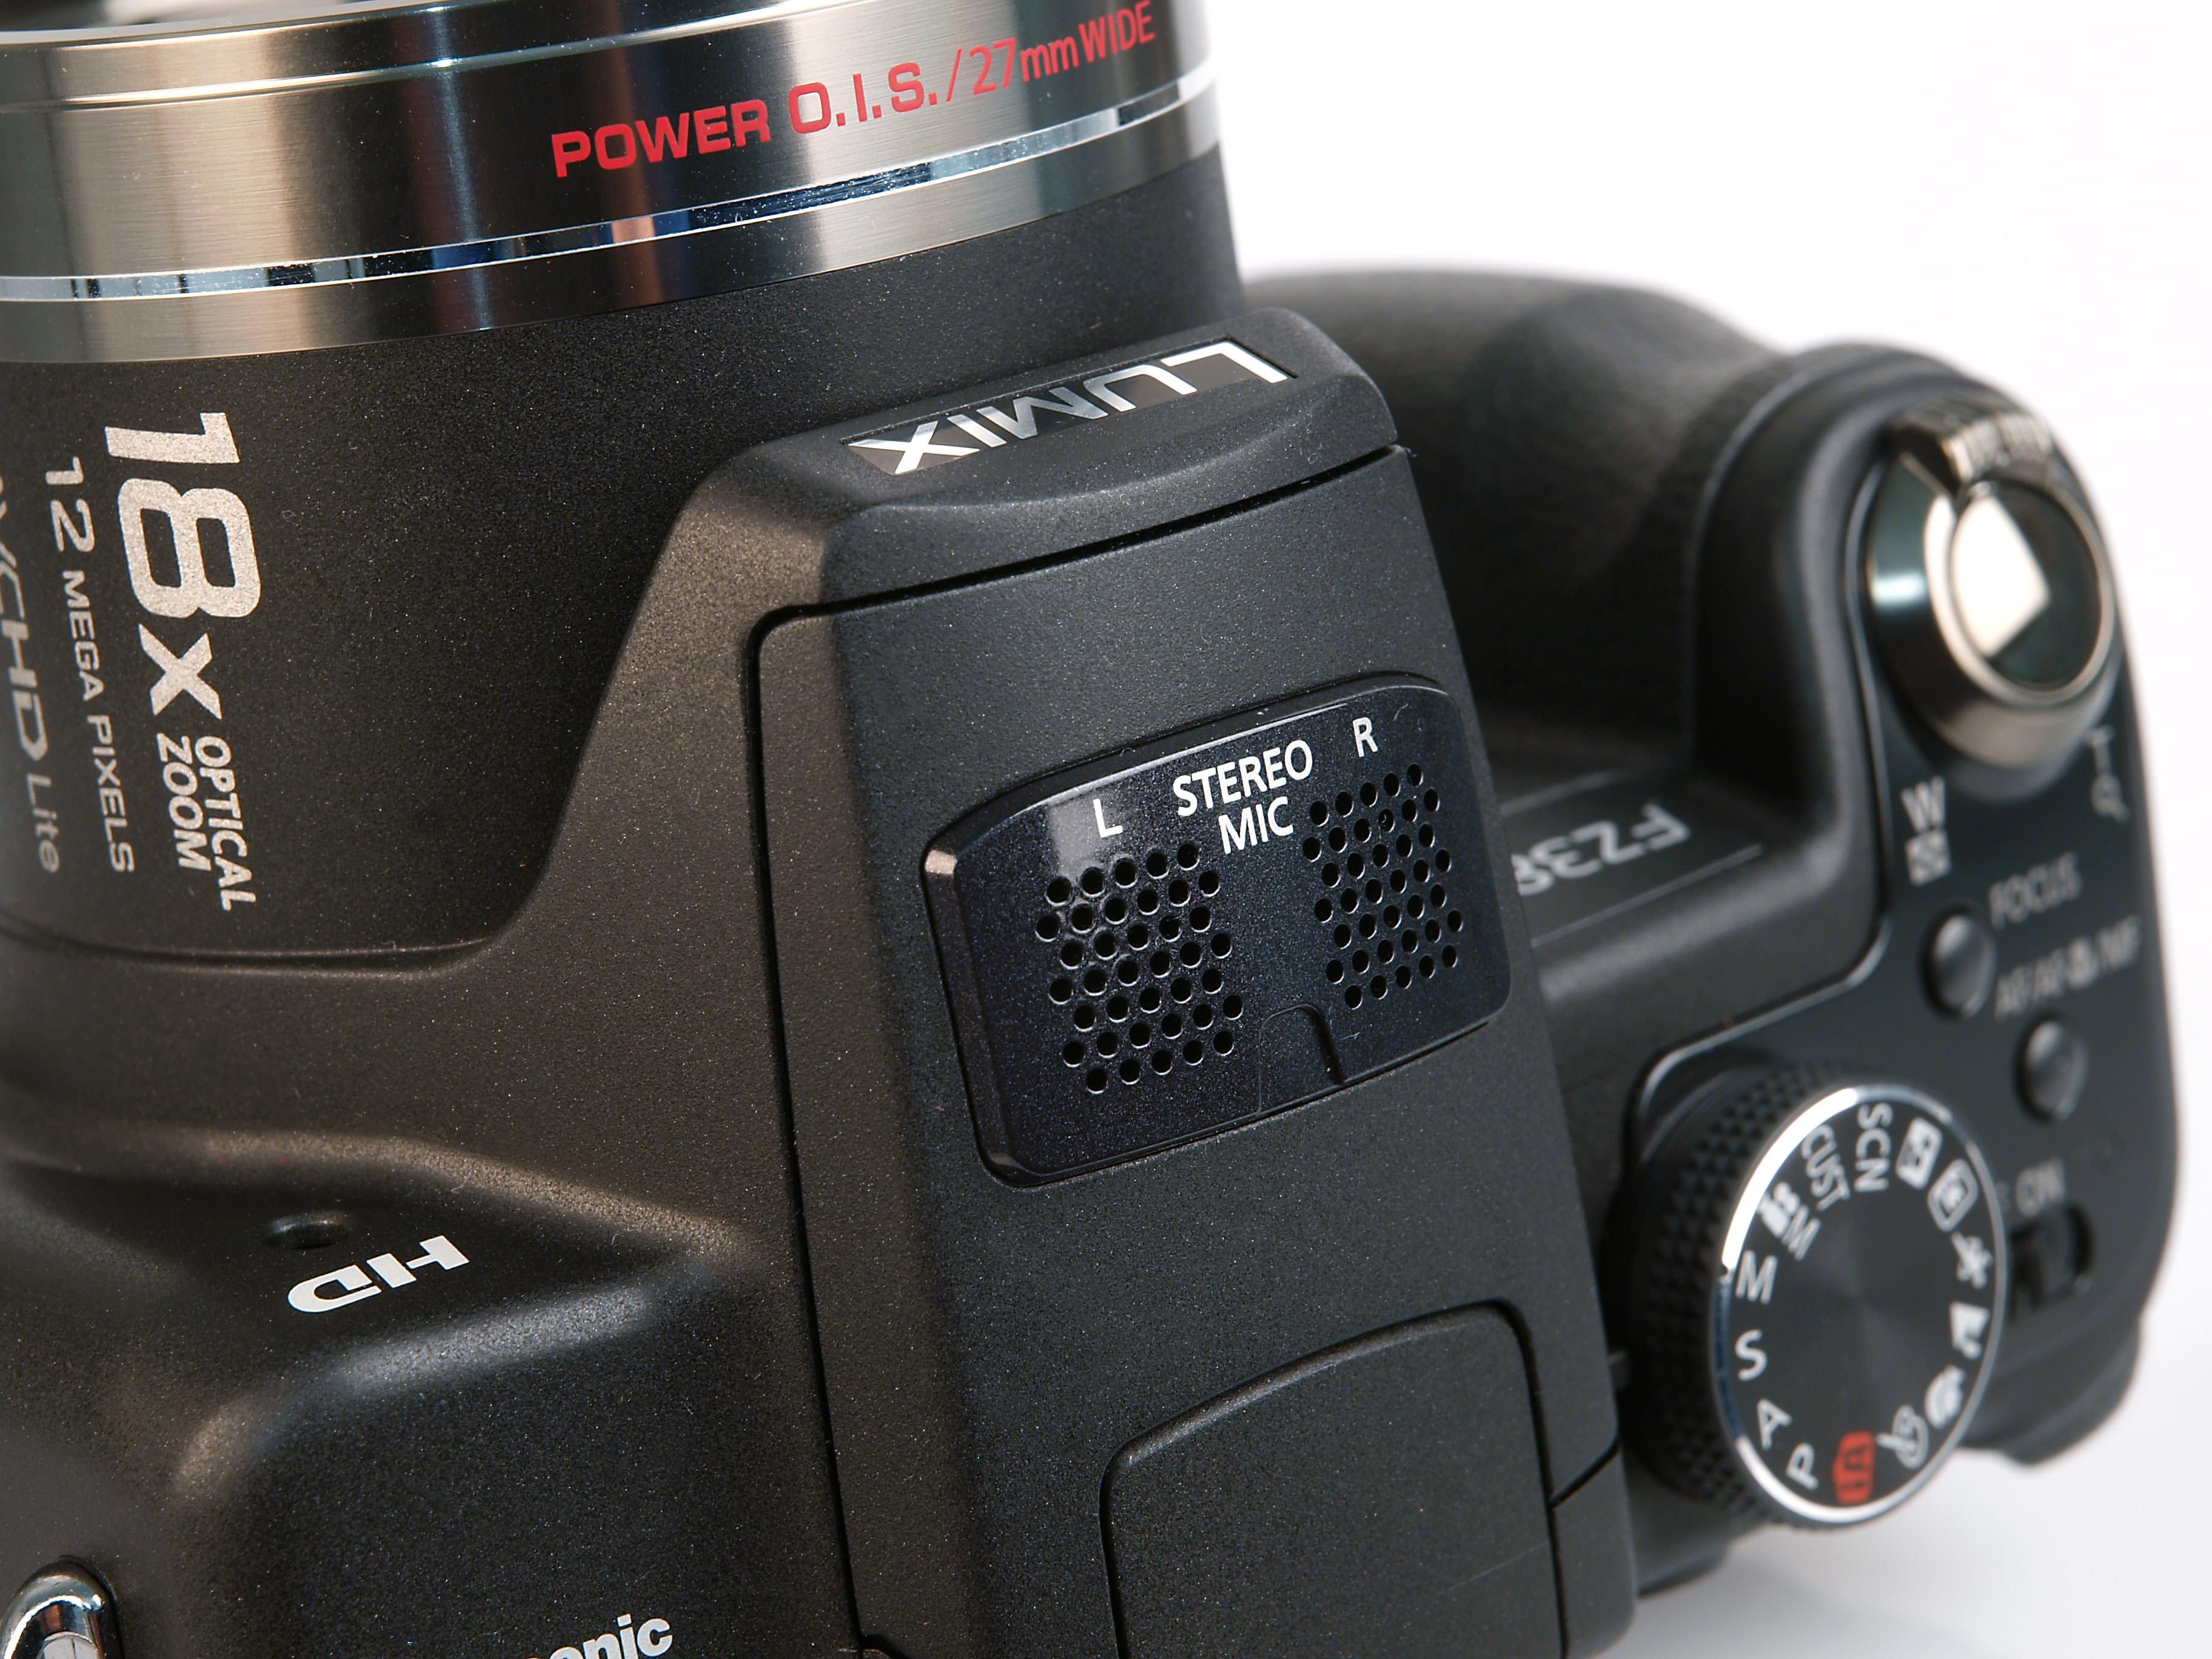 panasonic lumix dmc fz38 first look digital camera review rh ephotozine com panasonic lumix fz38 manual panasonic dmc-fz38 manual